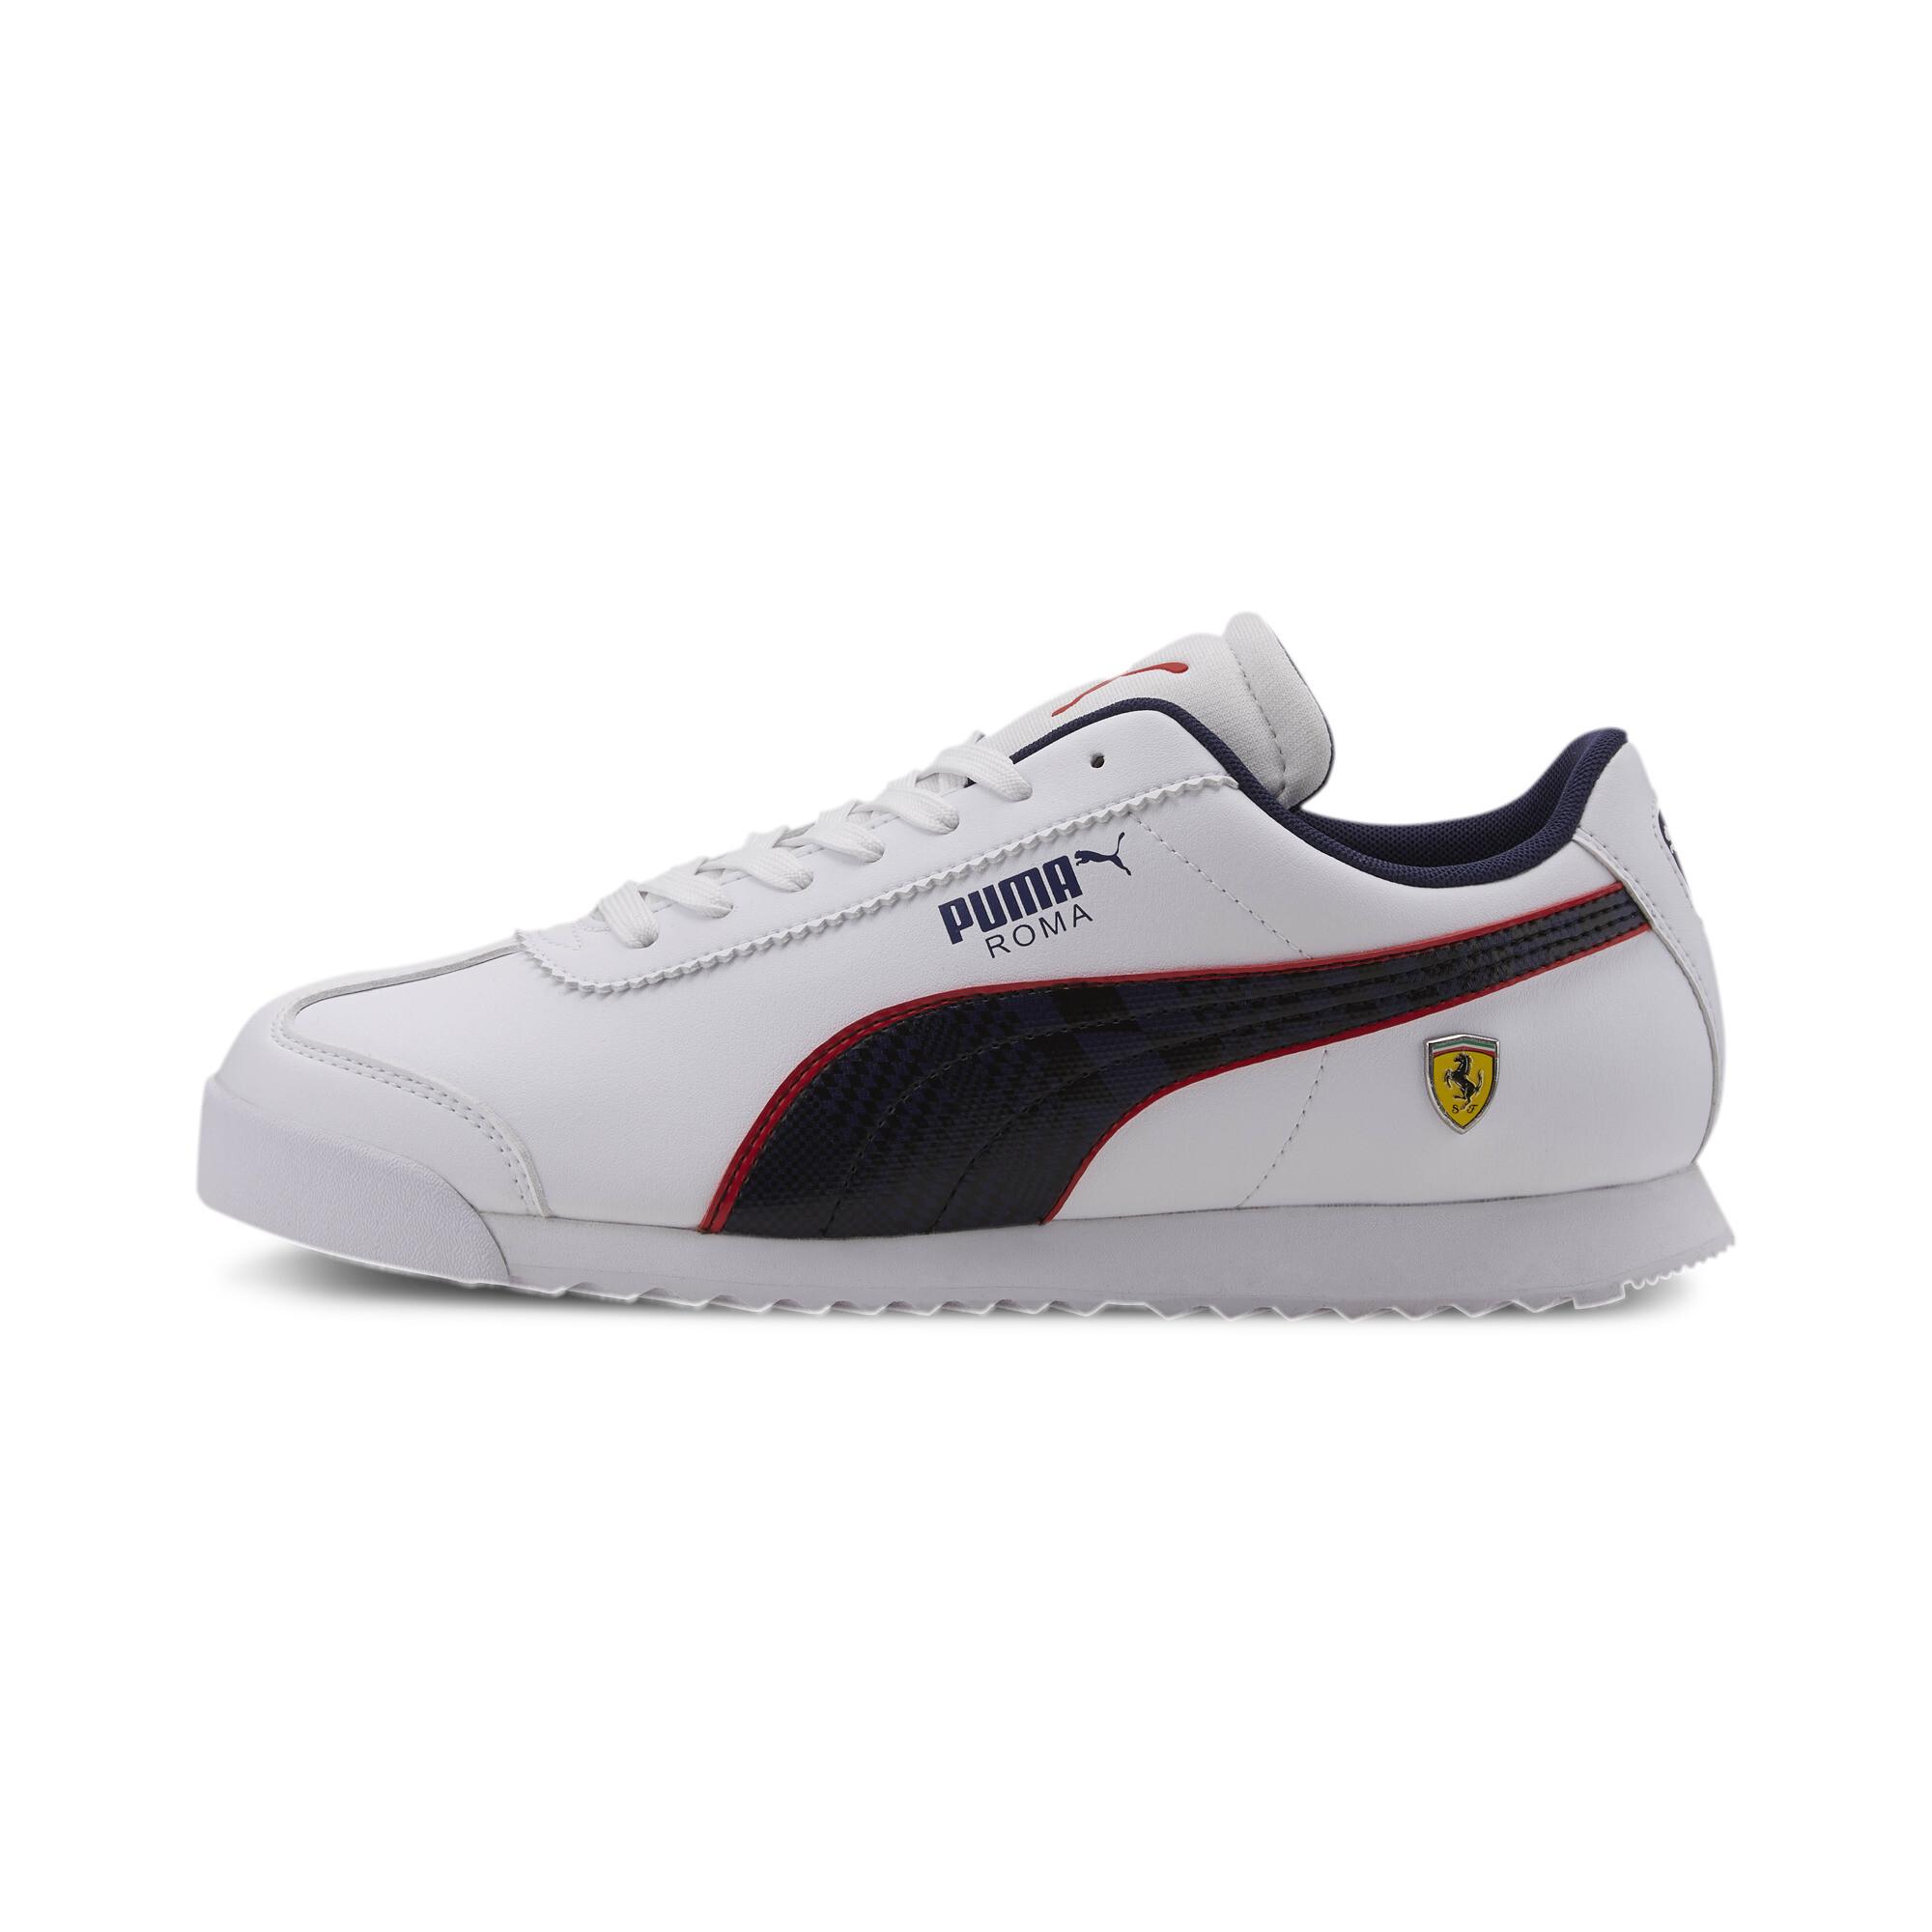 PUMA-Men-039-s-Scuderia-Ferrari-Roma-Sneakers thumbnail 11